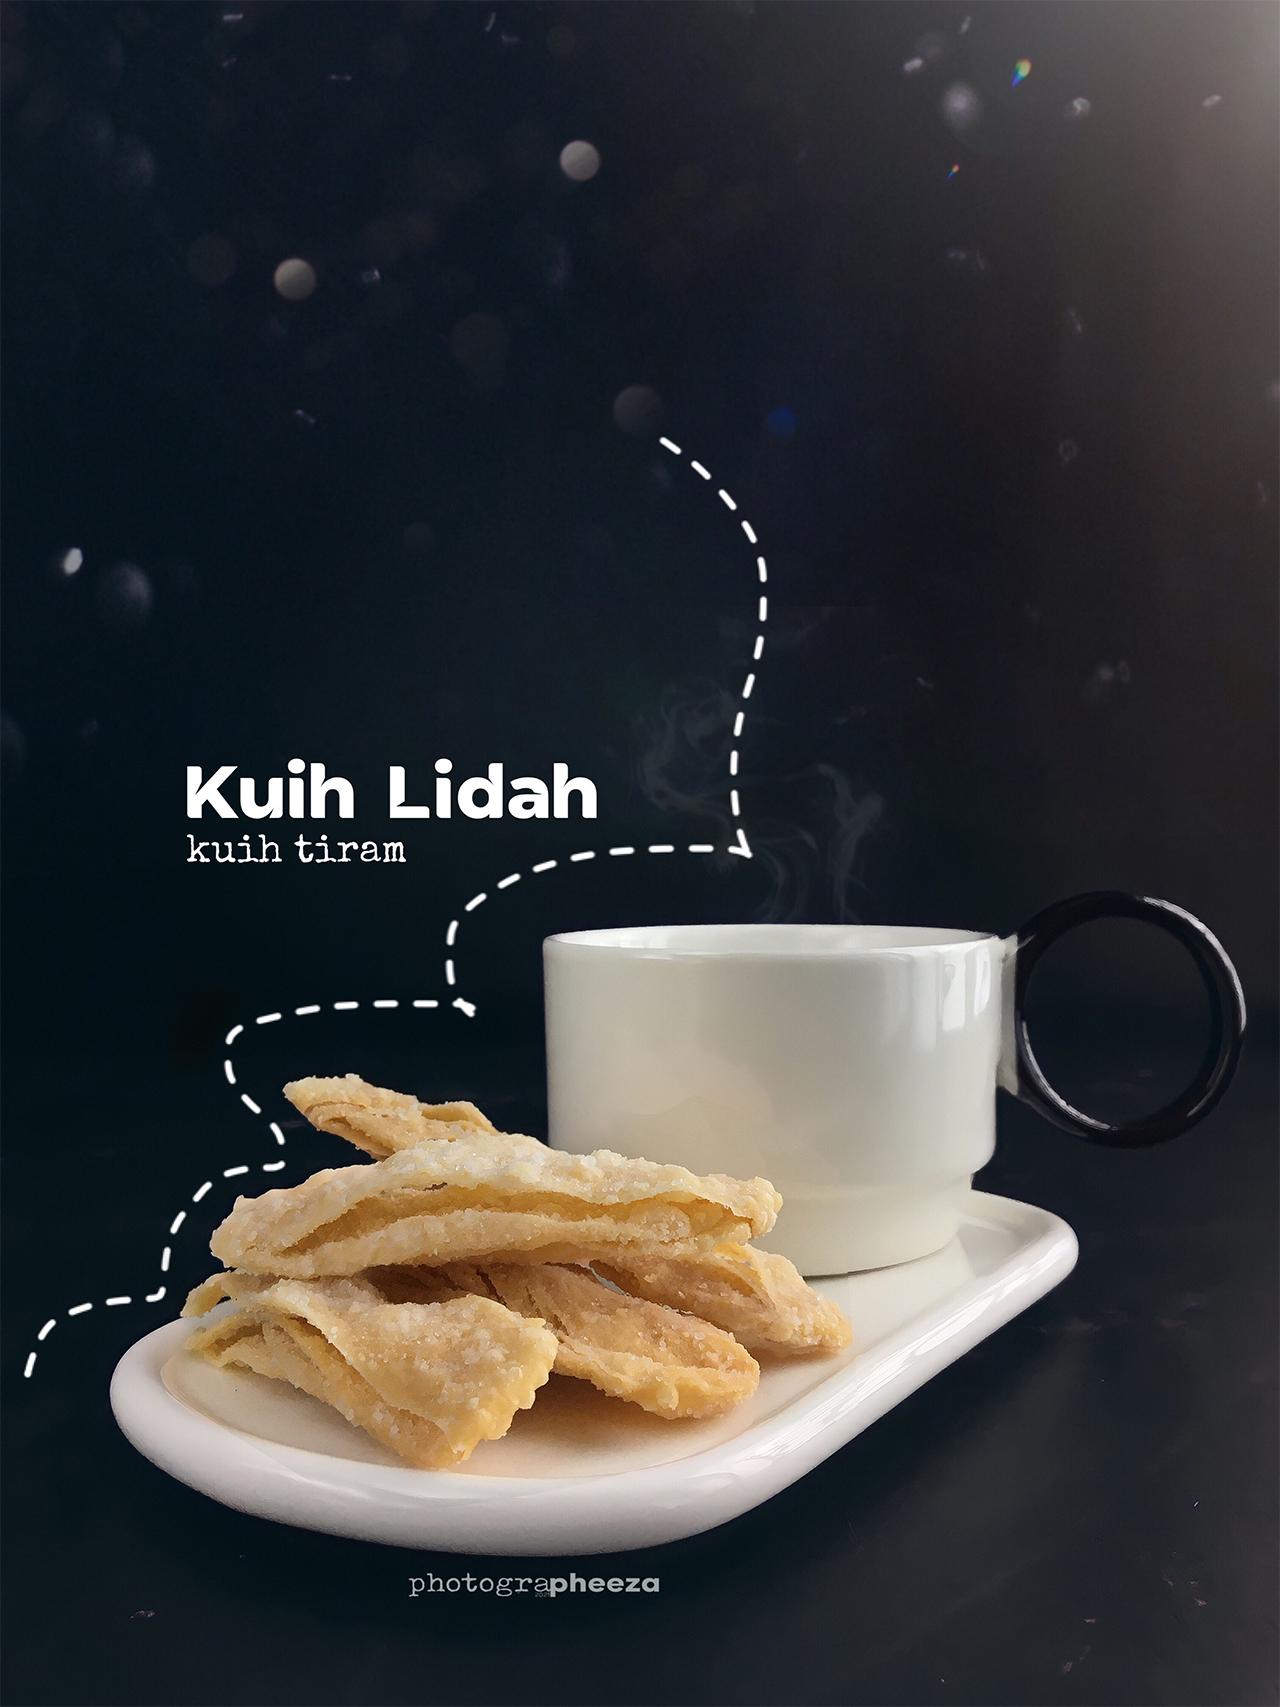 Kuih Lidah @Kuih Tiram